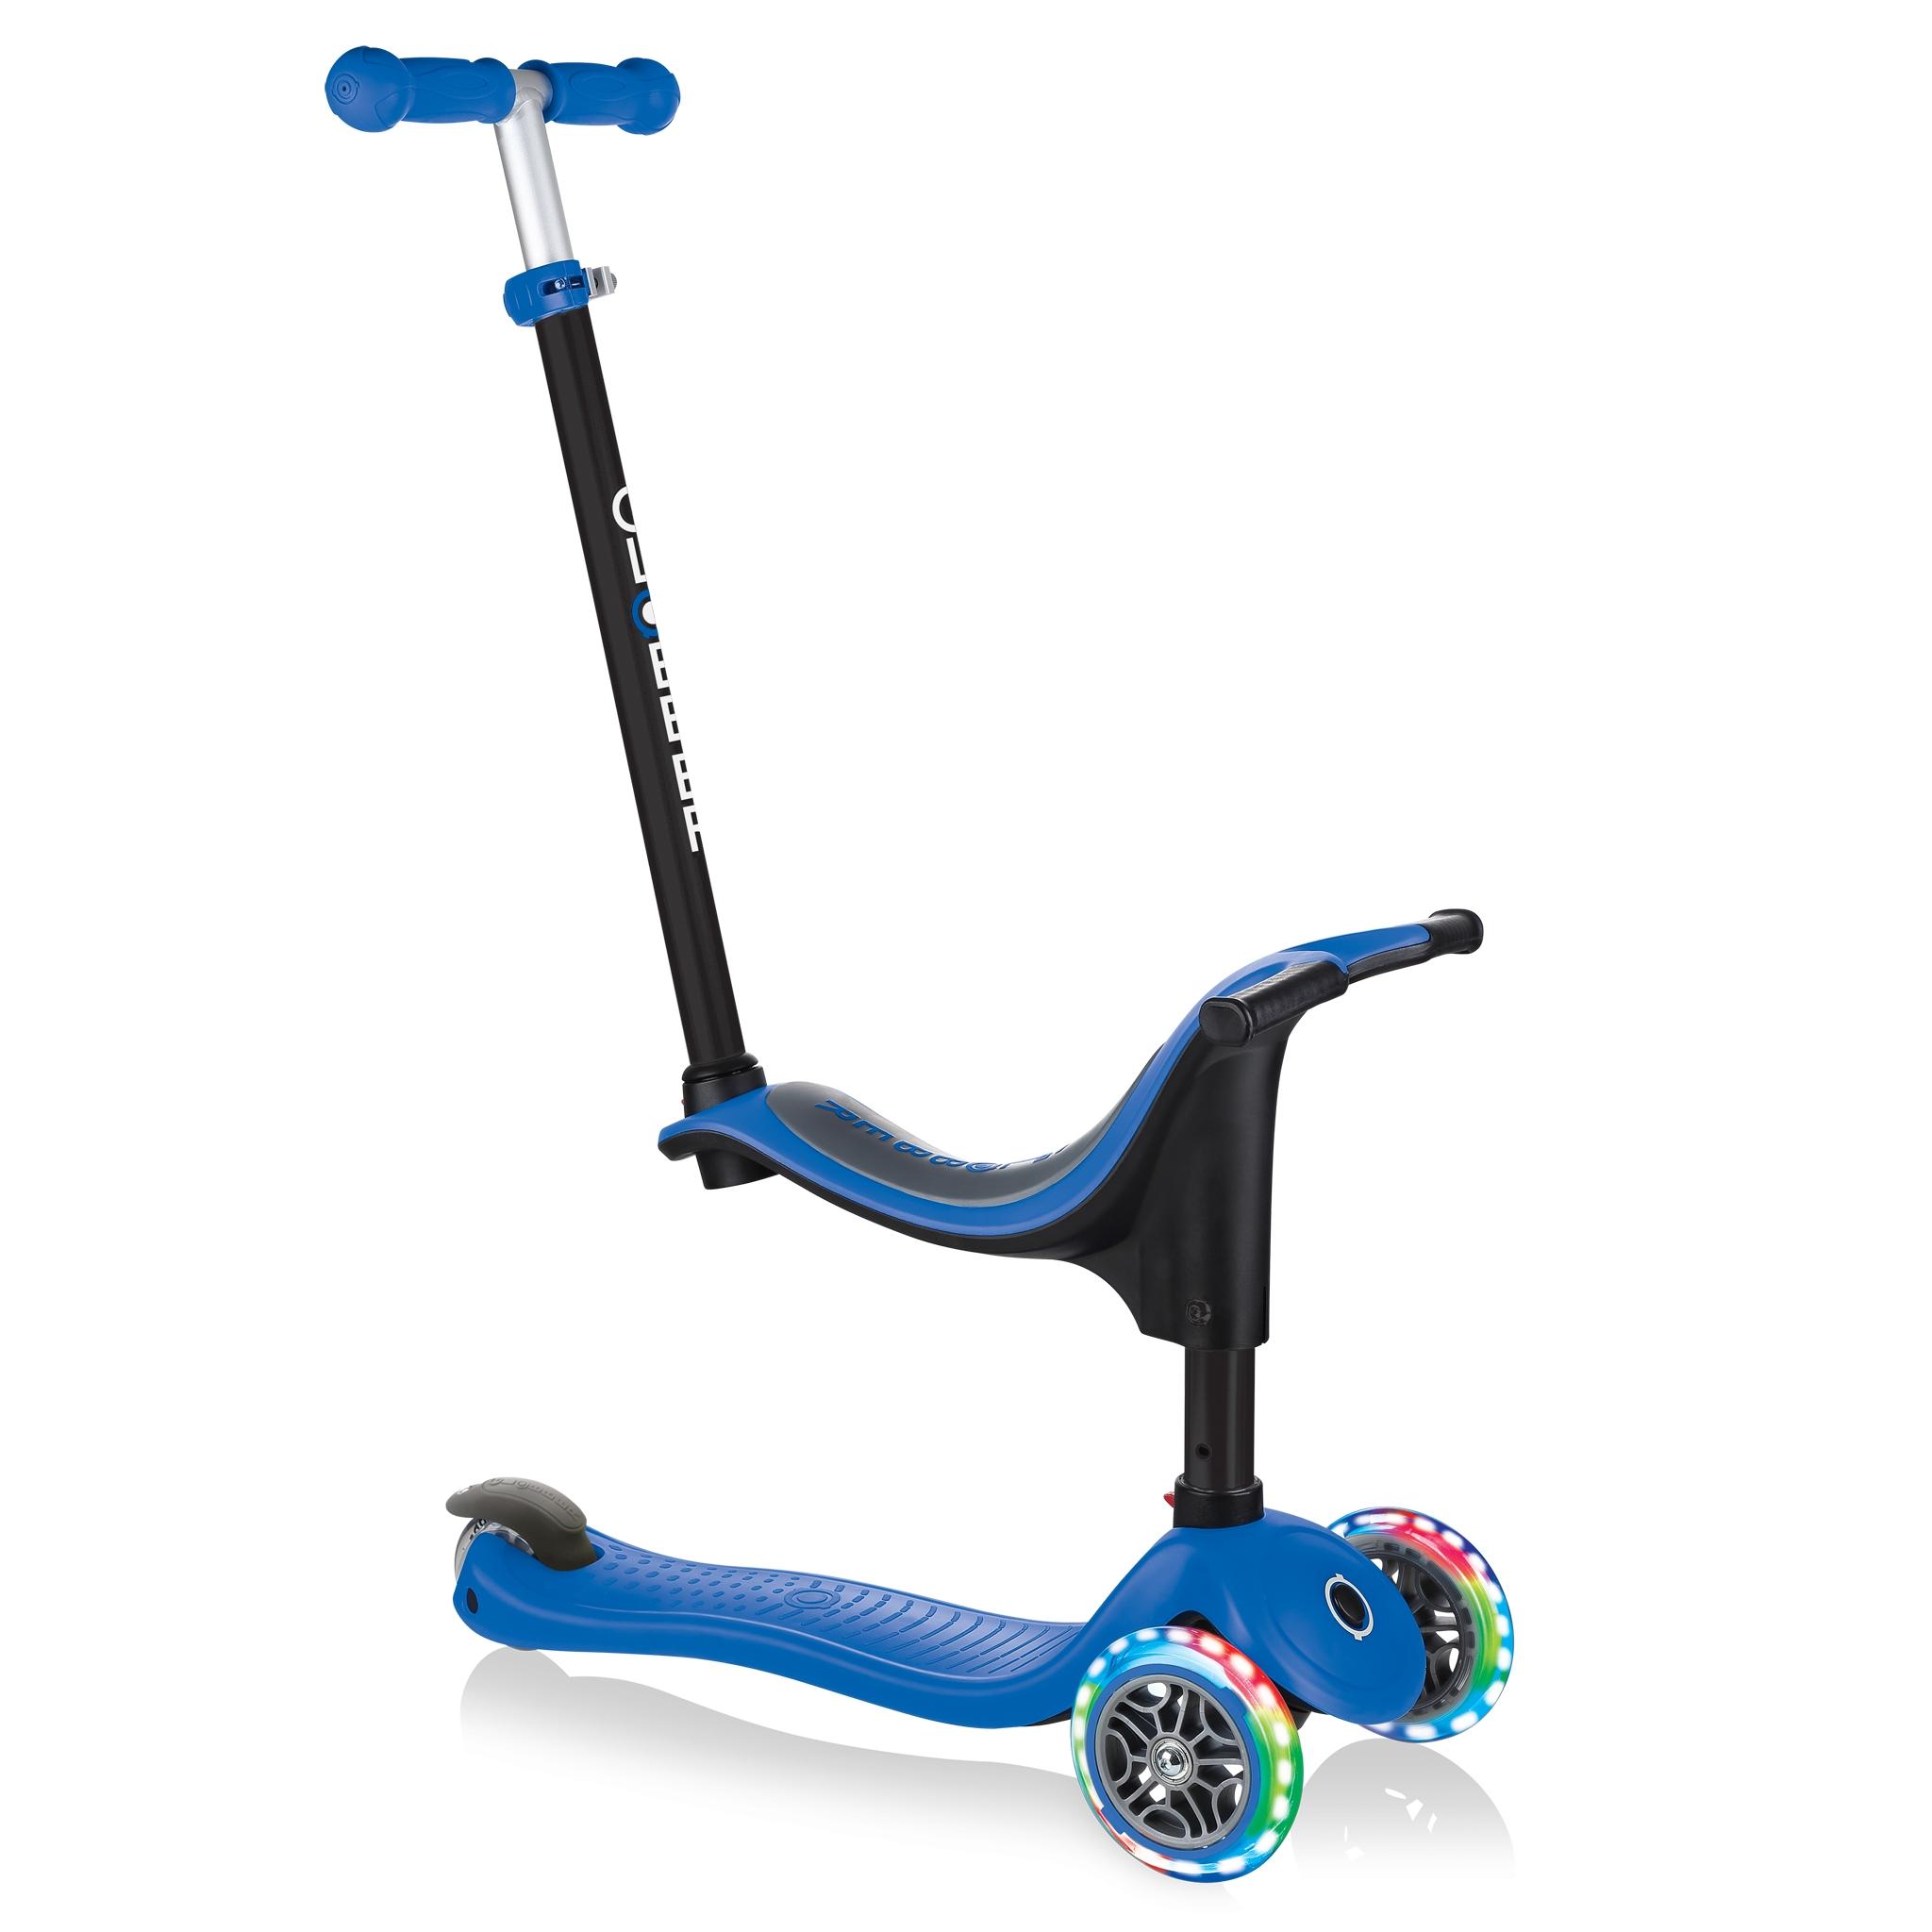 GO-UP-SPORTY-LIGHTS-ride-on-walking-bike-scooter-navy-blue